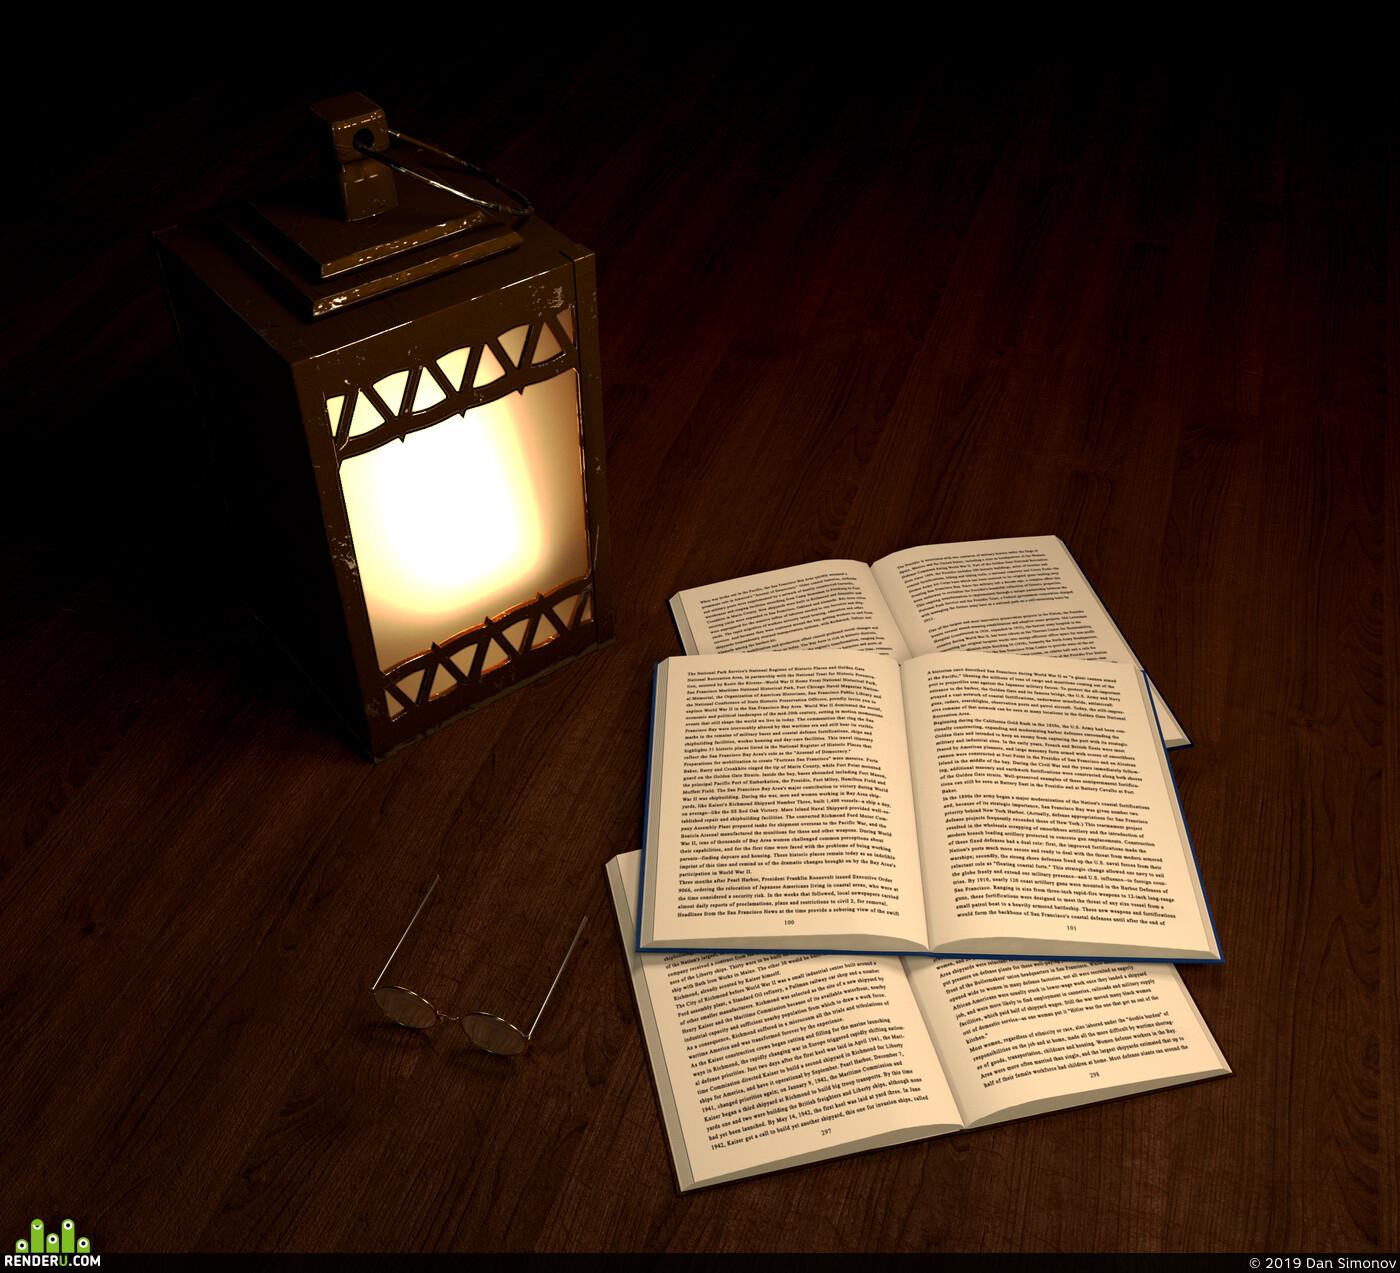 фонарь, стол, очки, книги, книга, Железо, лампа